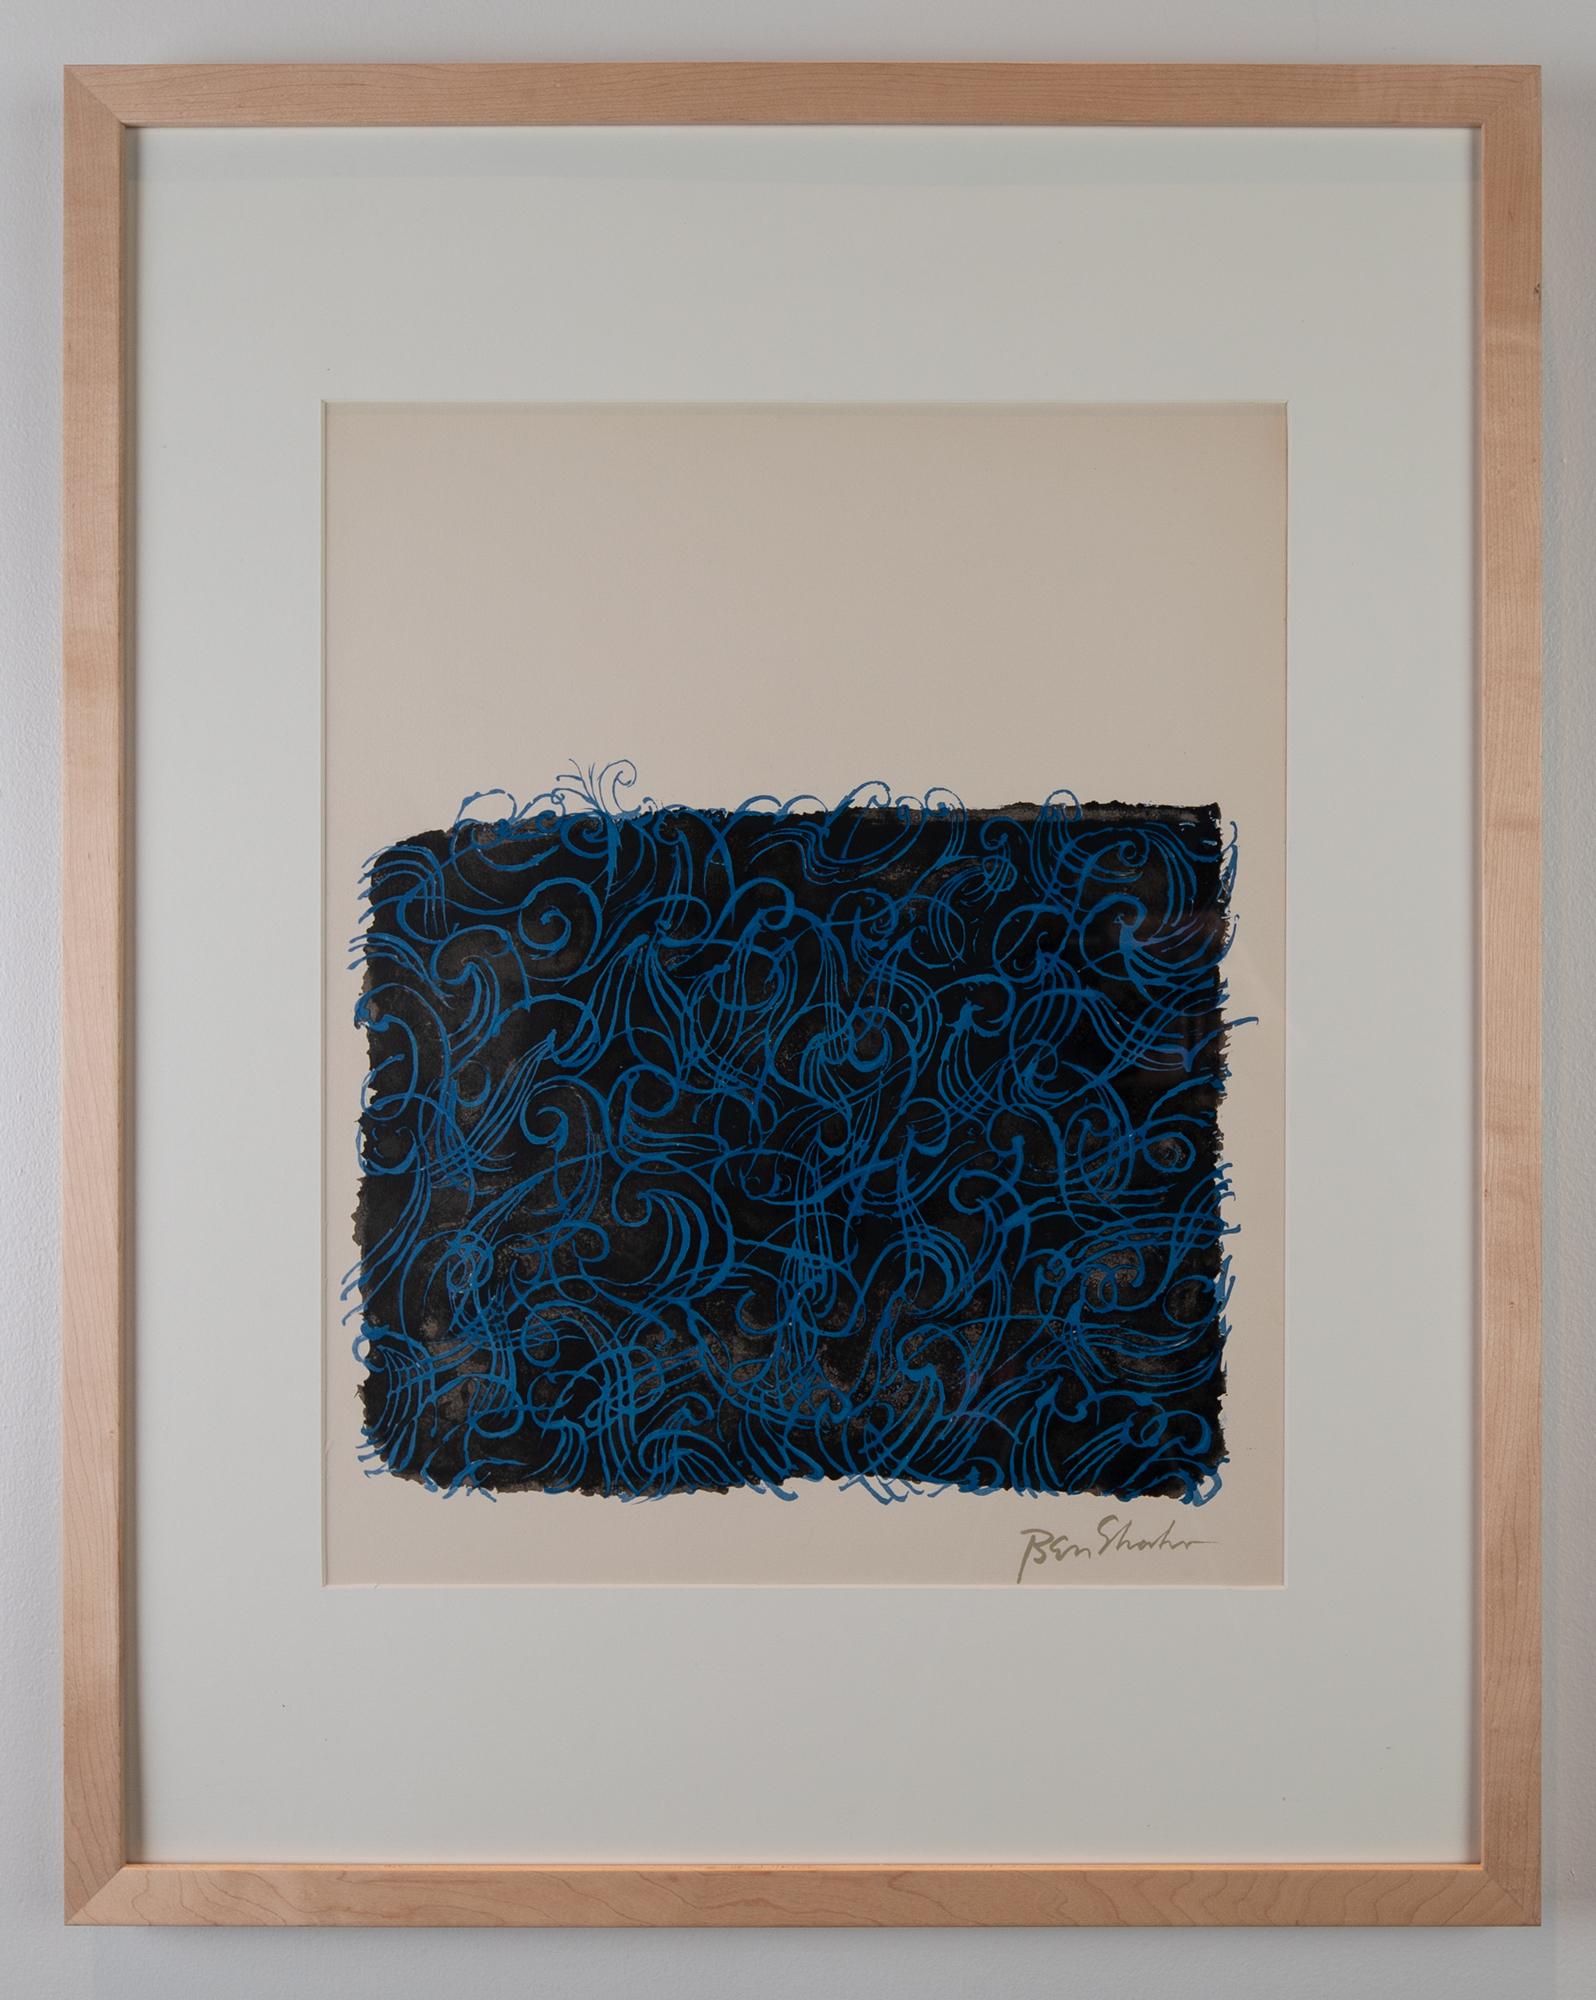 Ben Shahn, XV The Sea Itself, Lithography, 22.5in. x 17.5, 1968